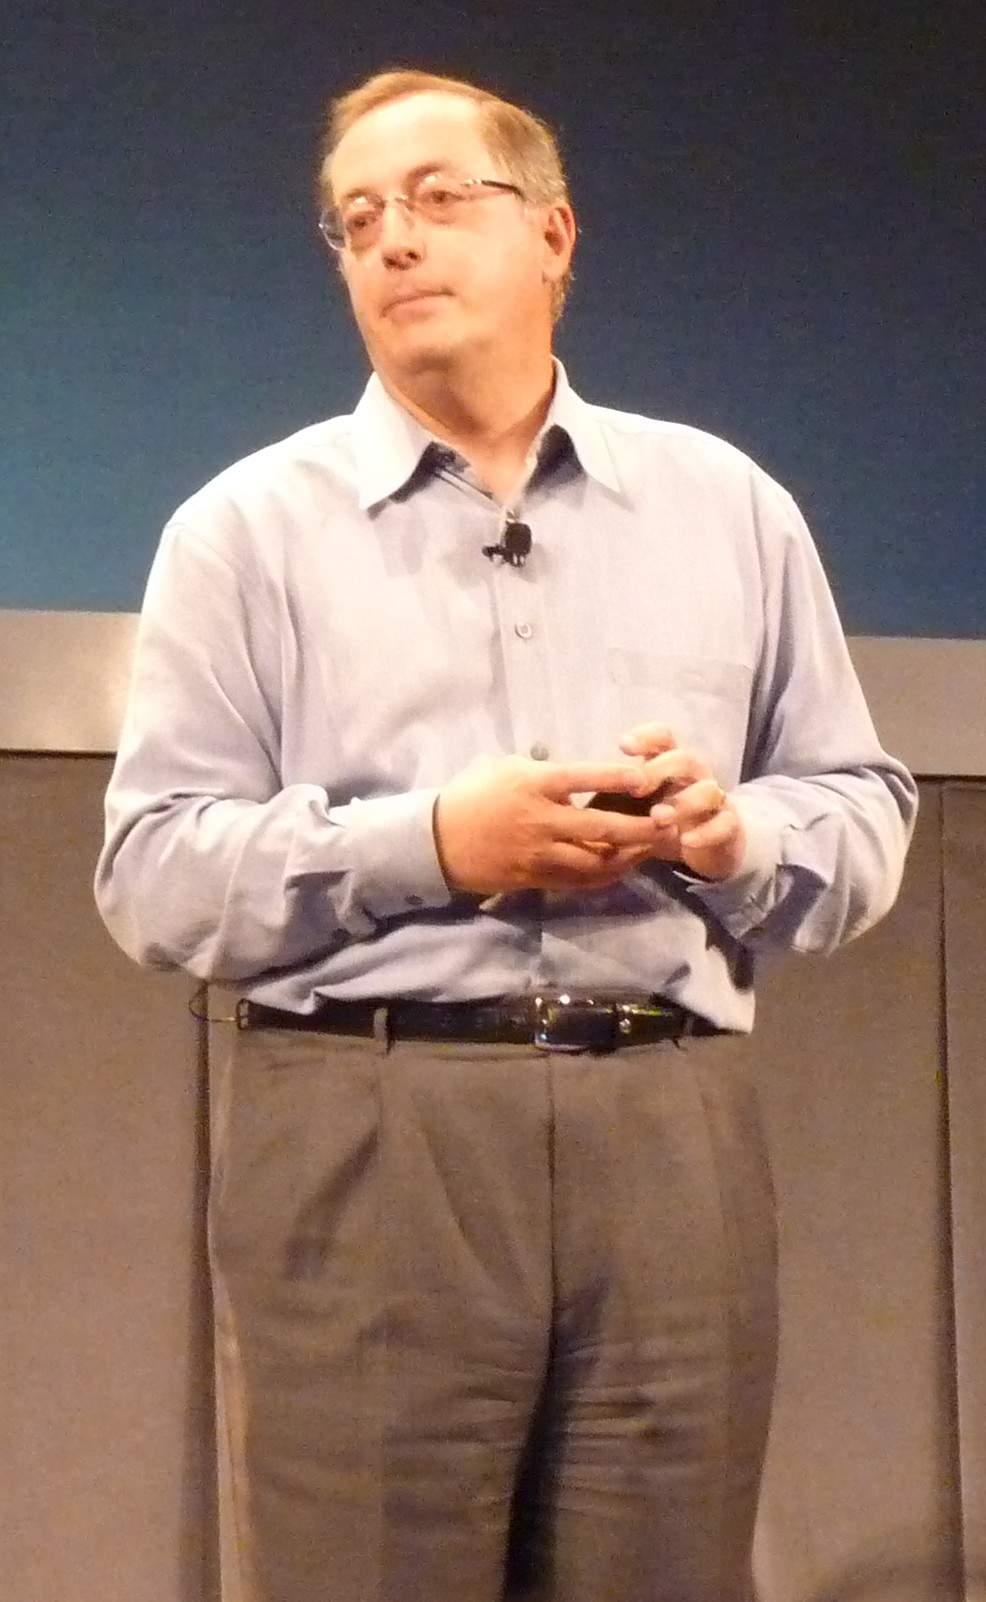 Intel, Paul Otellini